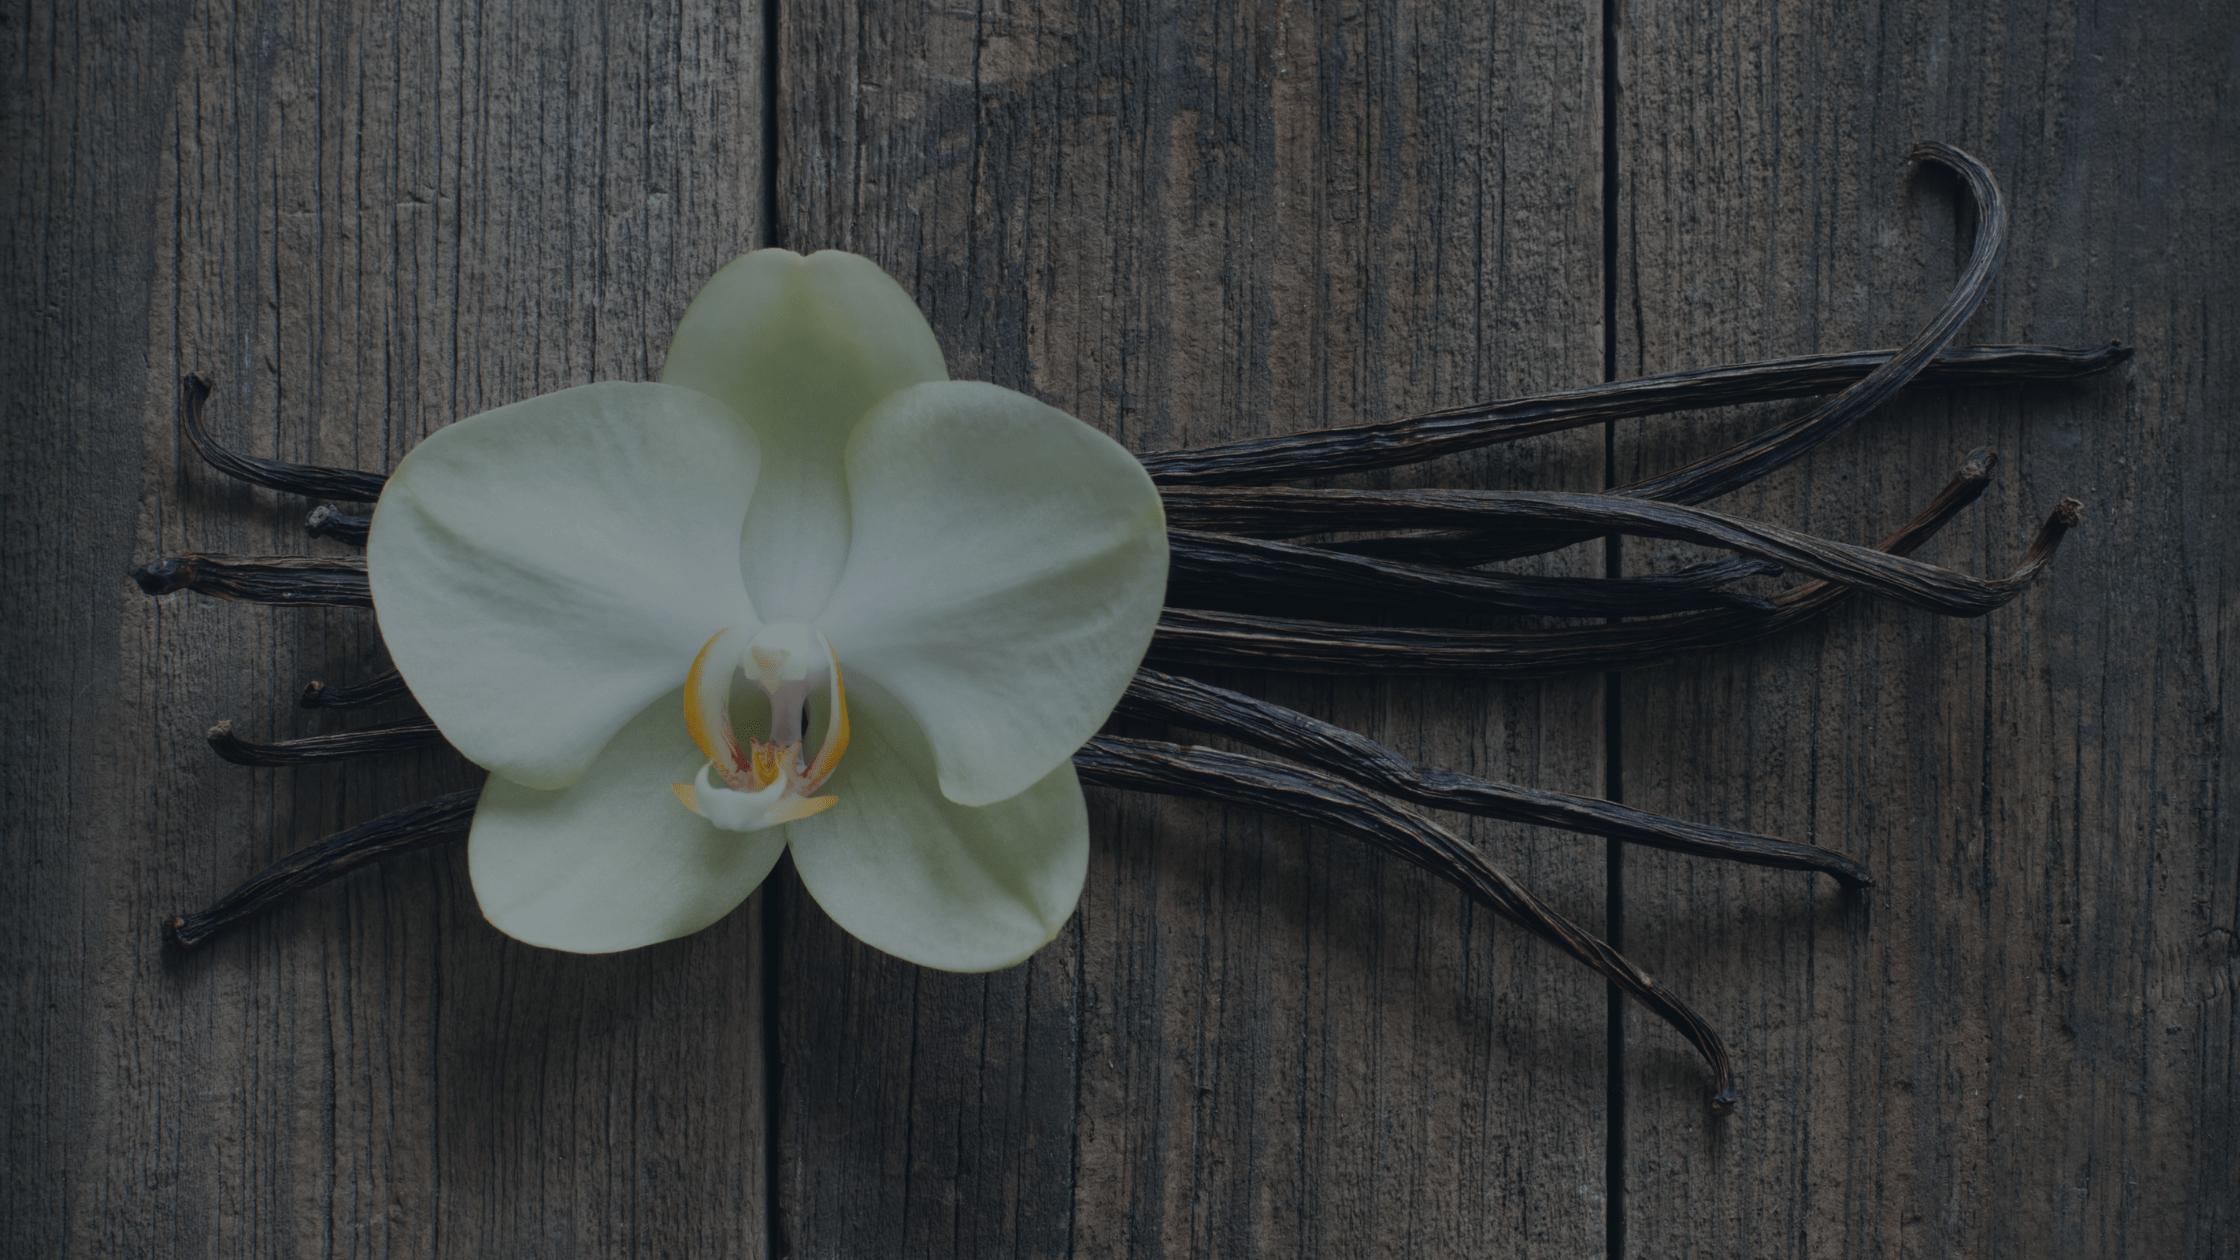 Why we say no to vanilla | Kraken Marketing